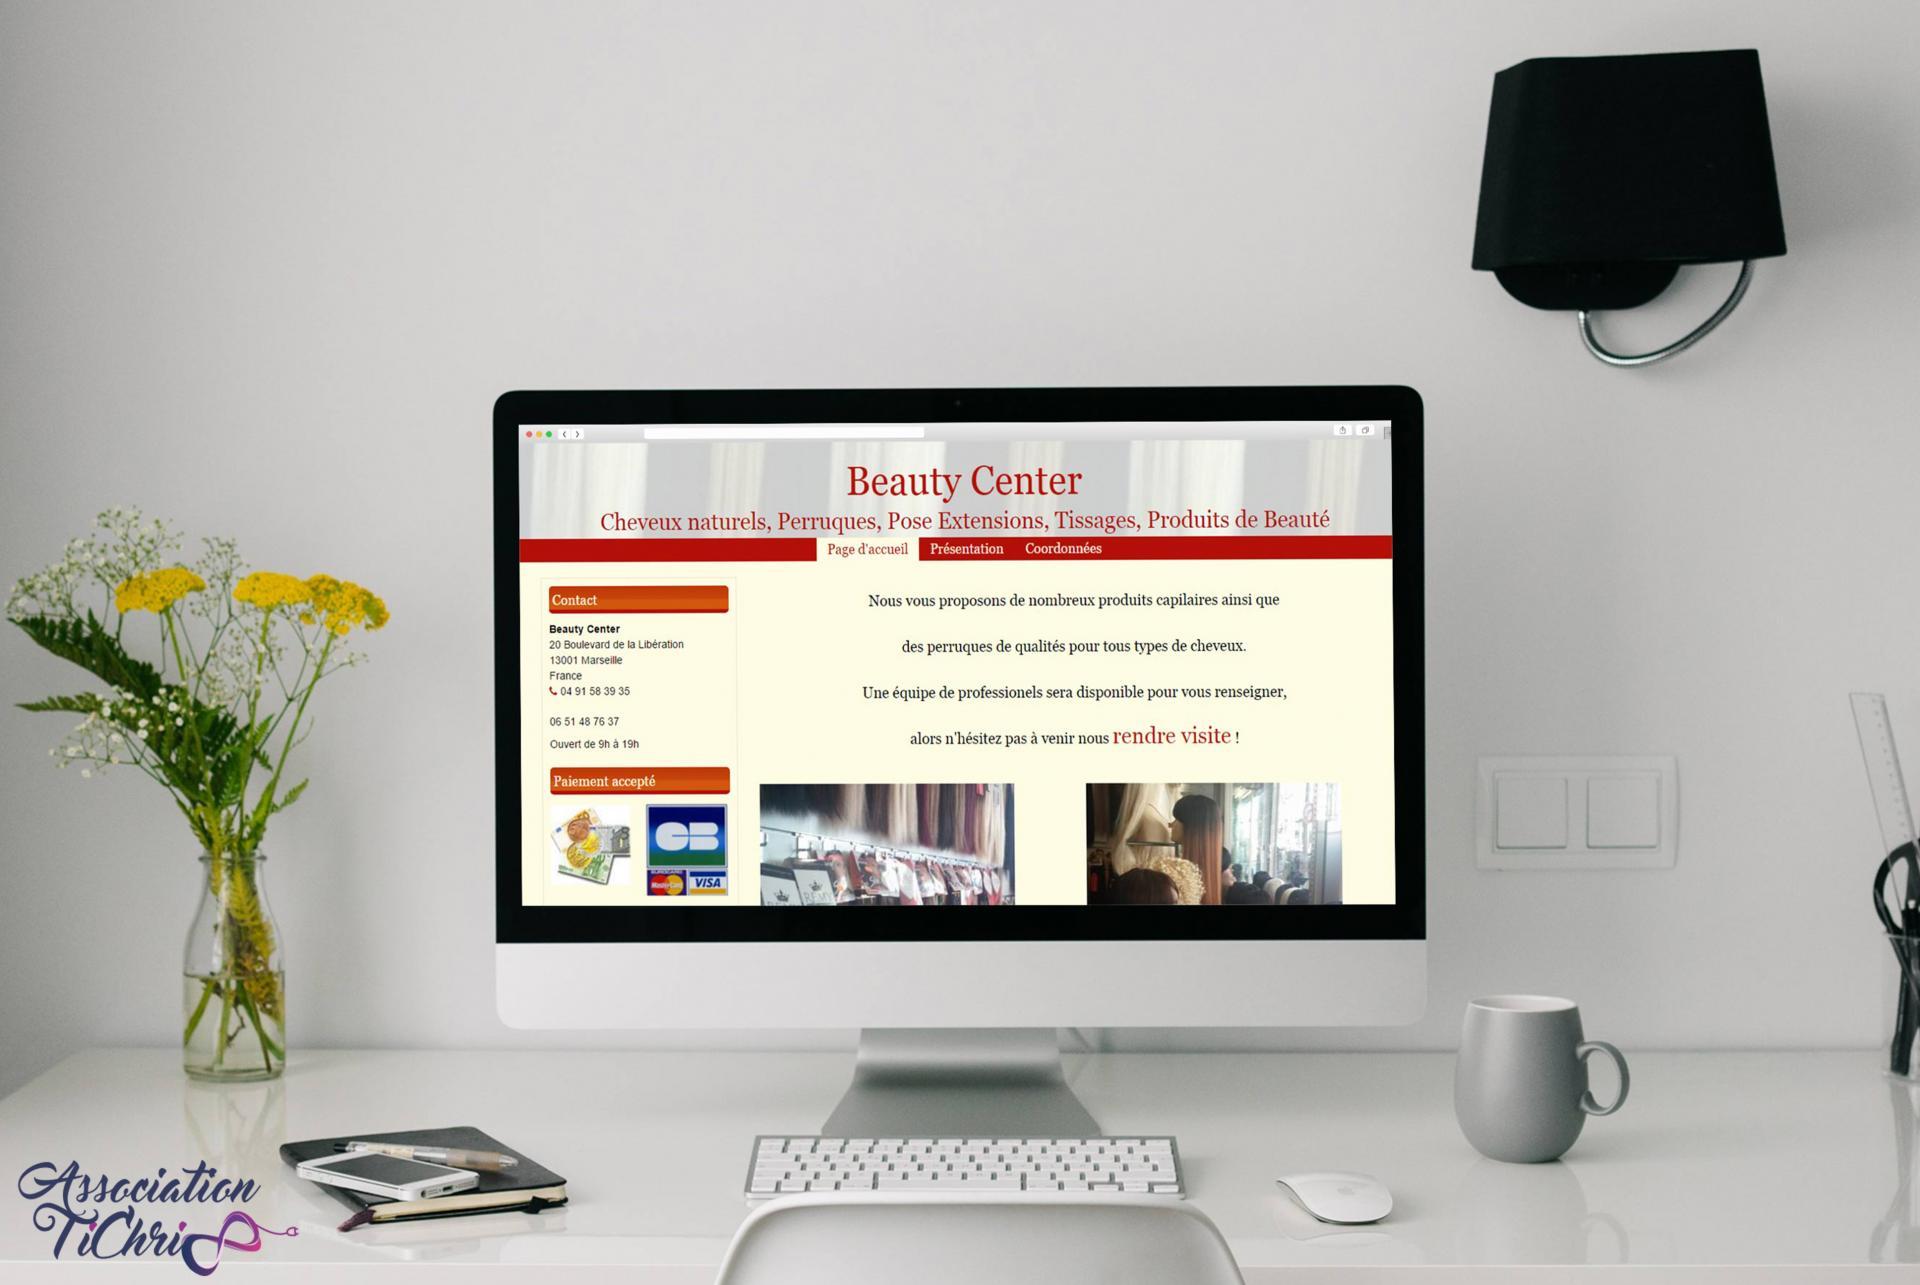 Centre de formation site web tichri53